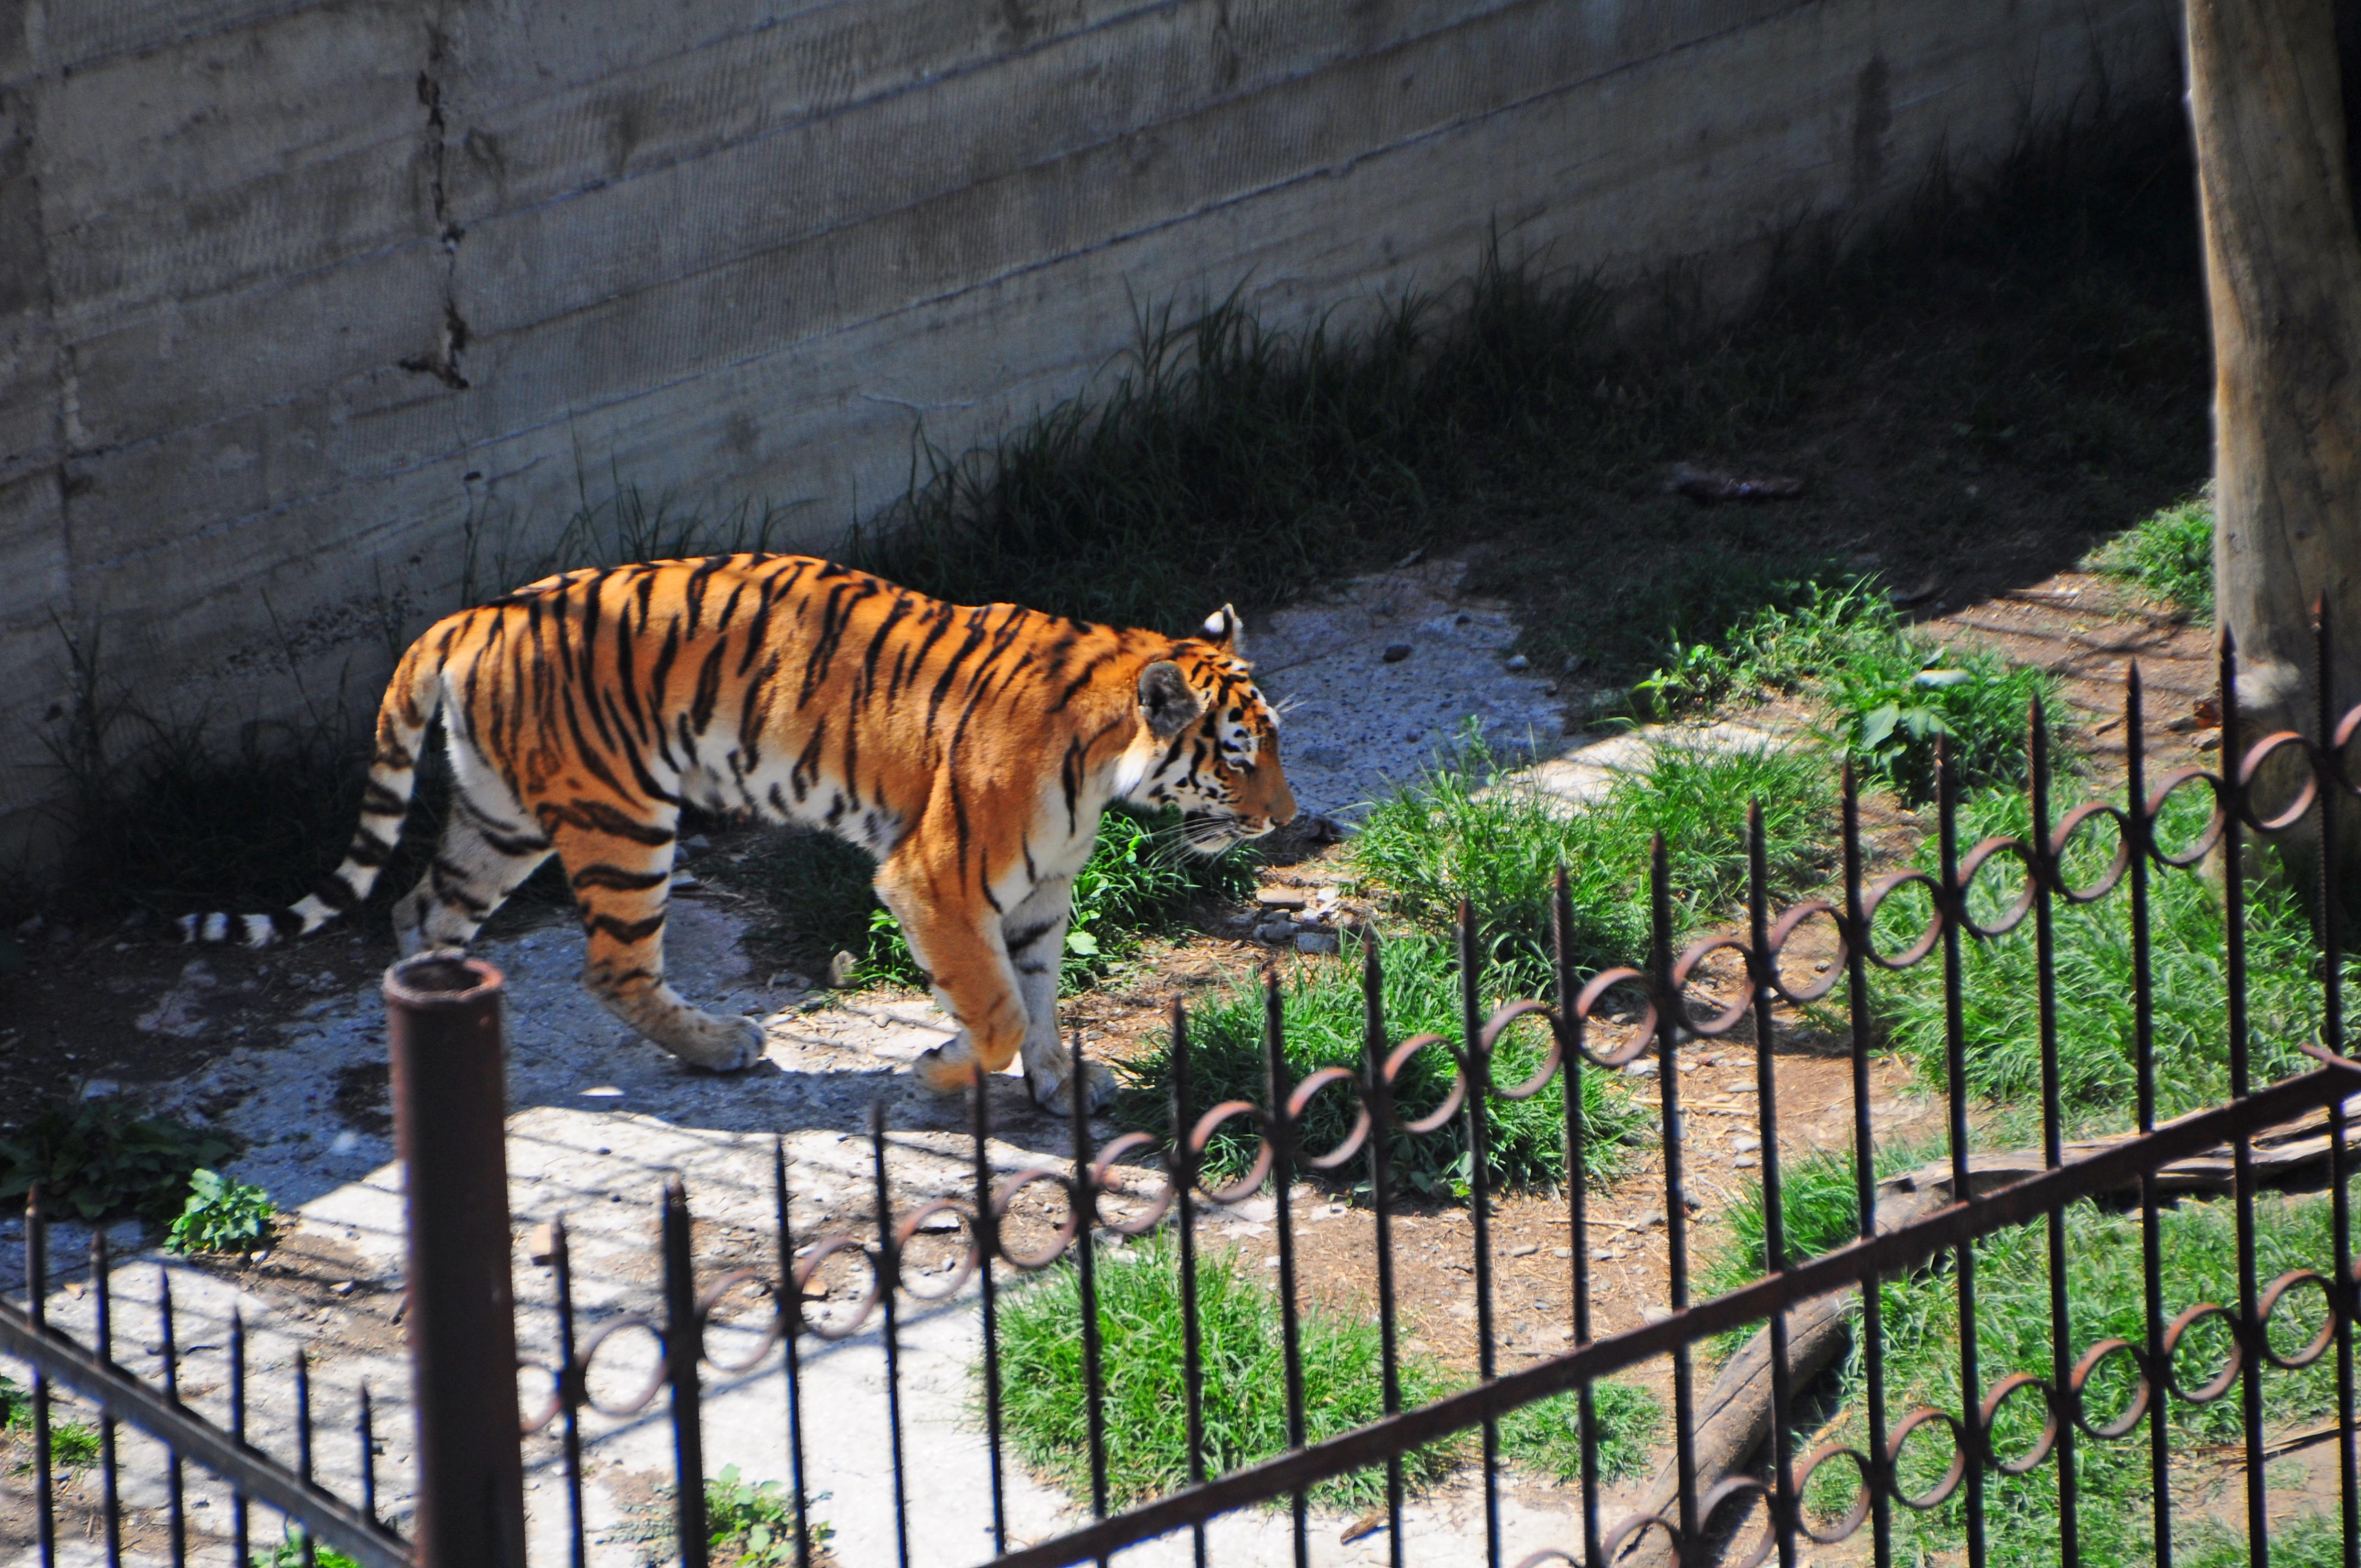 FileTbilisi zoo tigerjpg  Wikimedia Commons